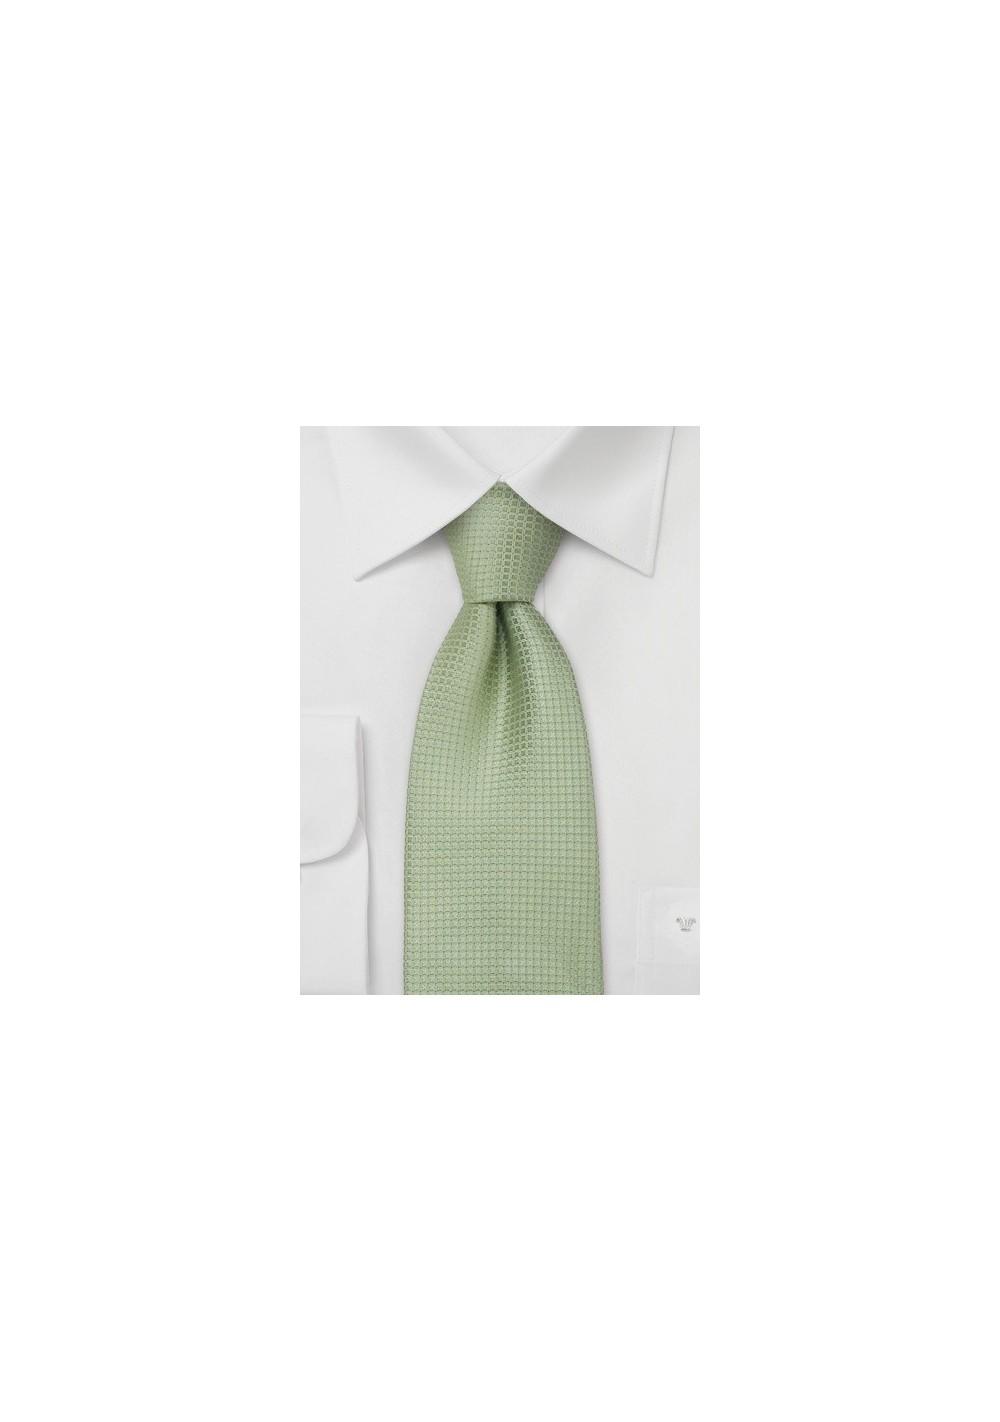 Extra Long Ties - Light apple green XL necktie